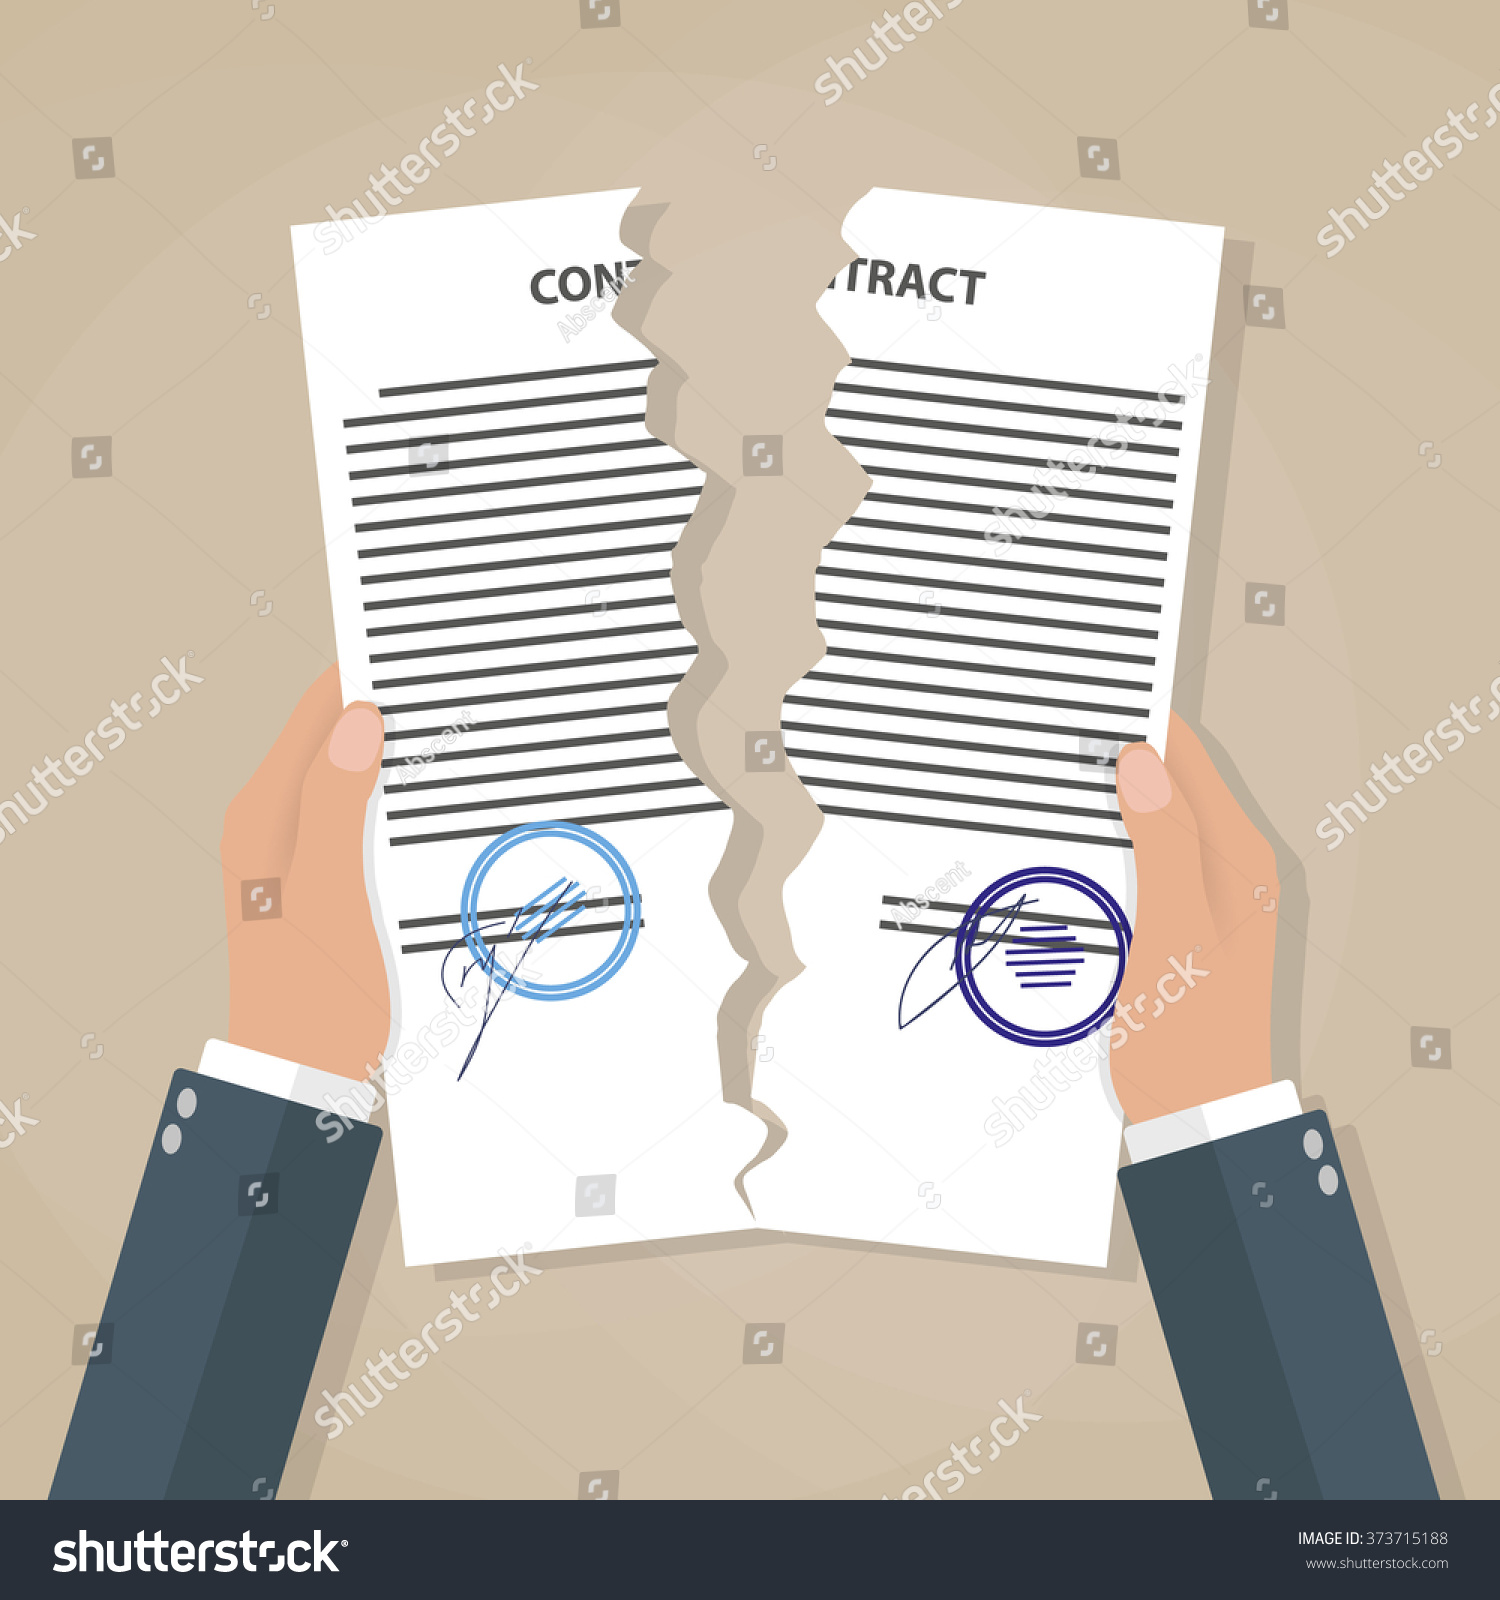 cartoon businessman hands tearing apart contract stock vector cartoon businessman hands tearing apart contract contract termination concept vector illustration in flat design